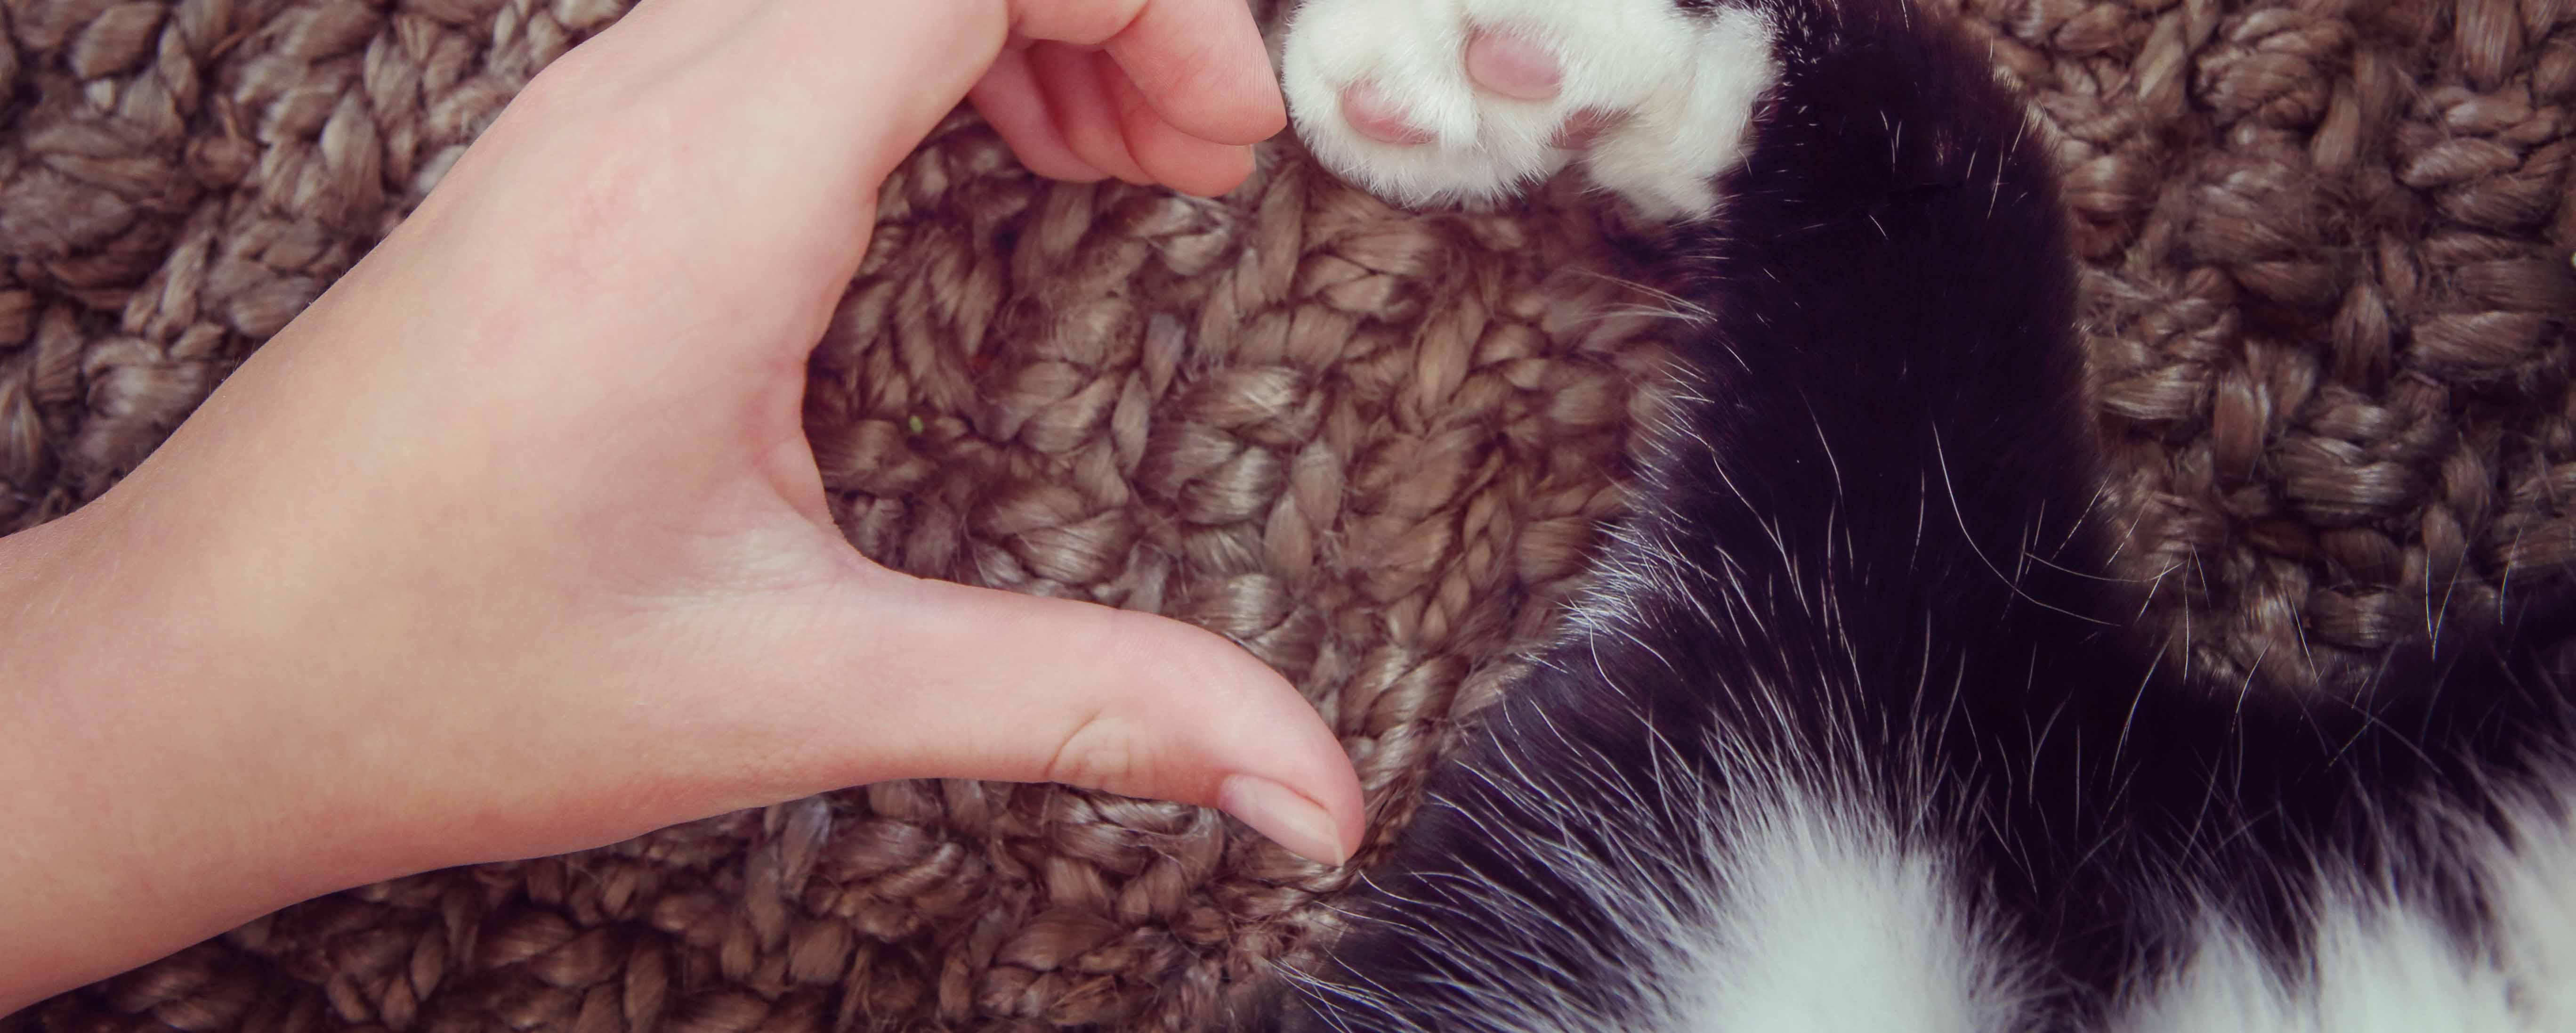 Sedating a cat before euthanasia debate